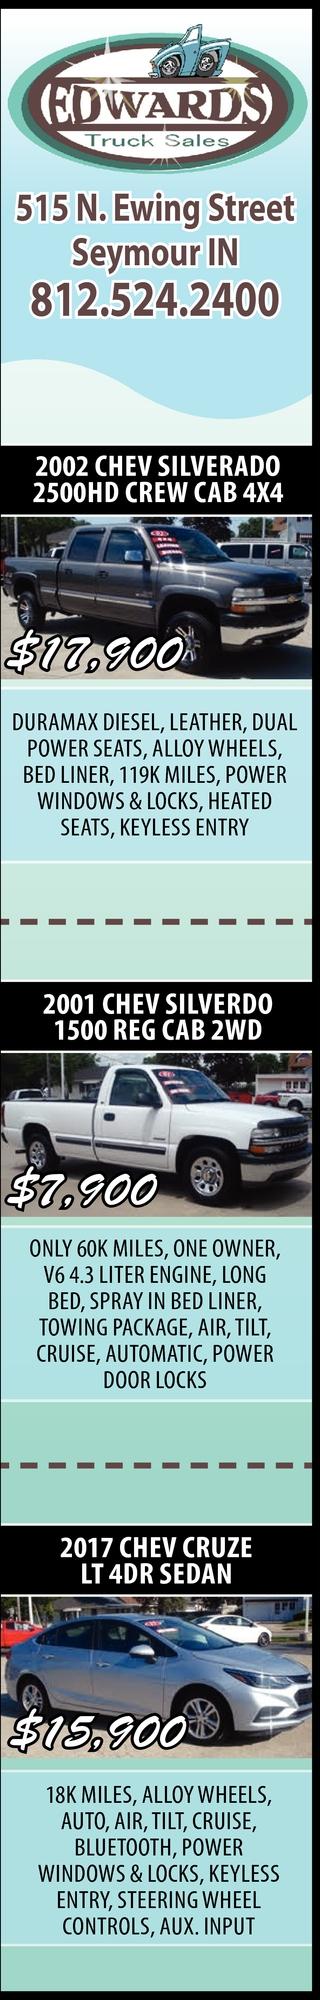 2002 Chev Silverado 2500HD Crew Cab 4x4